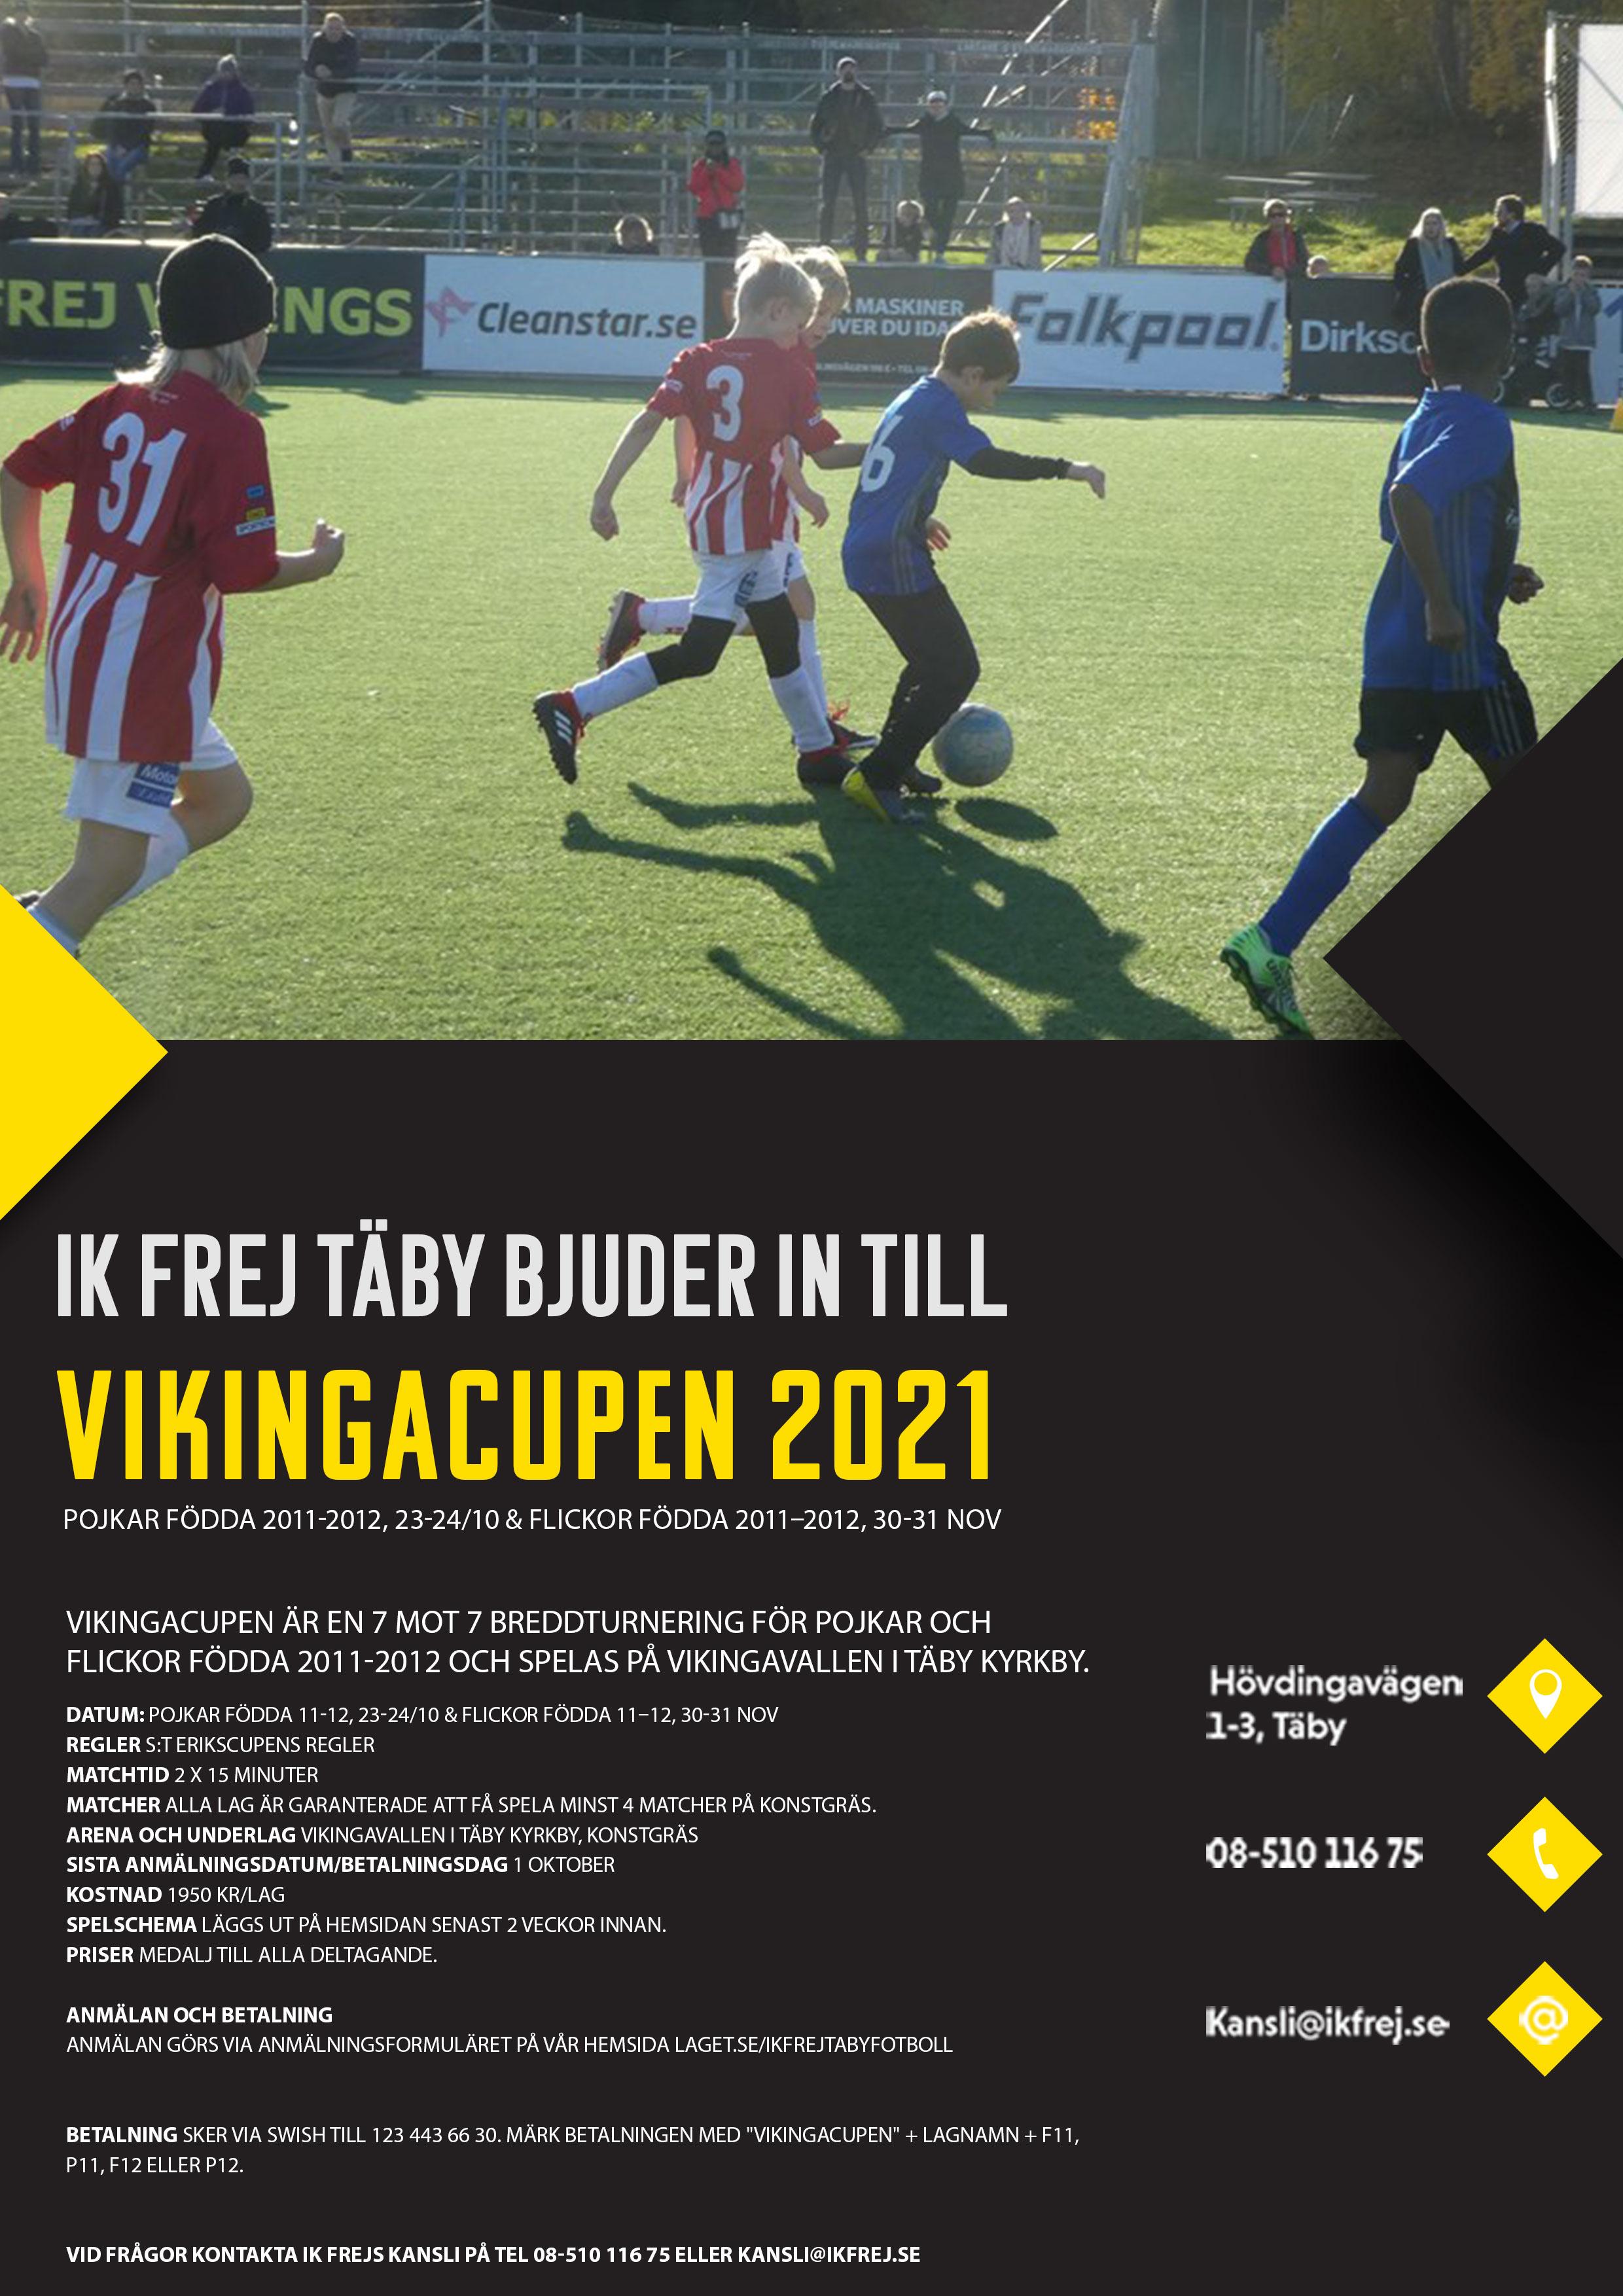 vikingacupen-2021-inbjudan.jpg